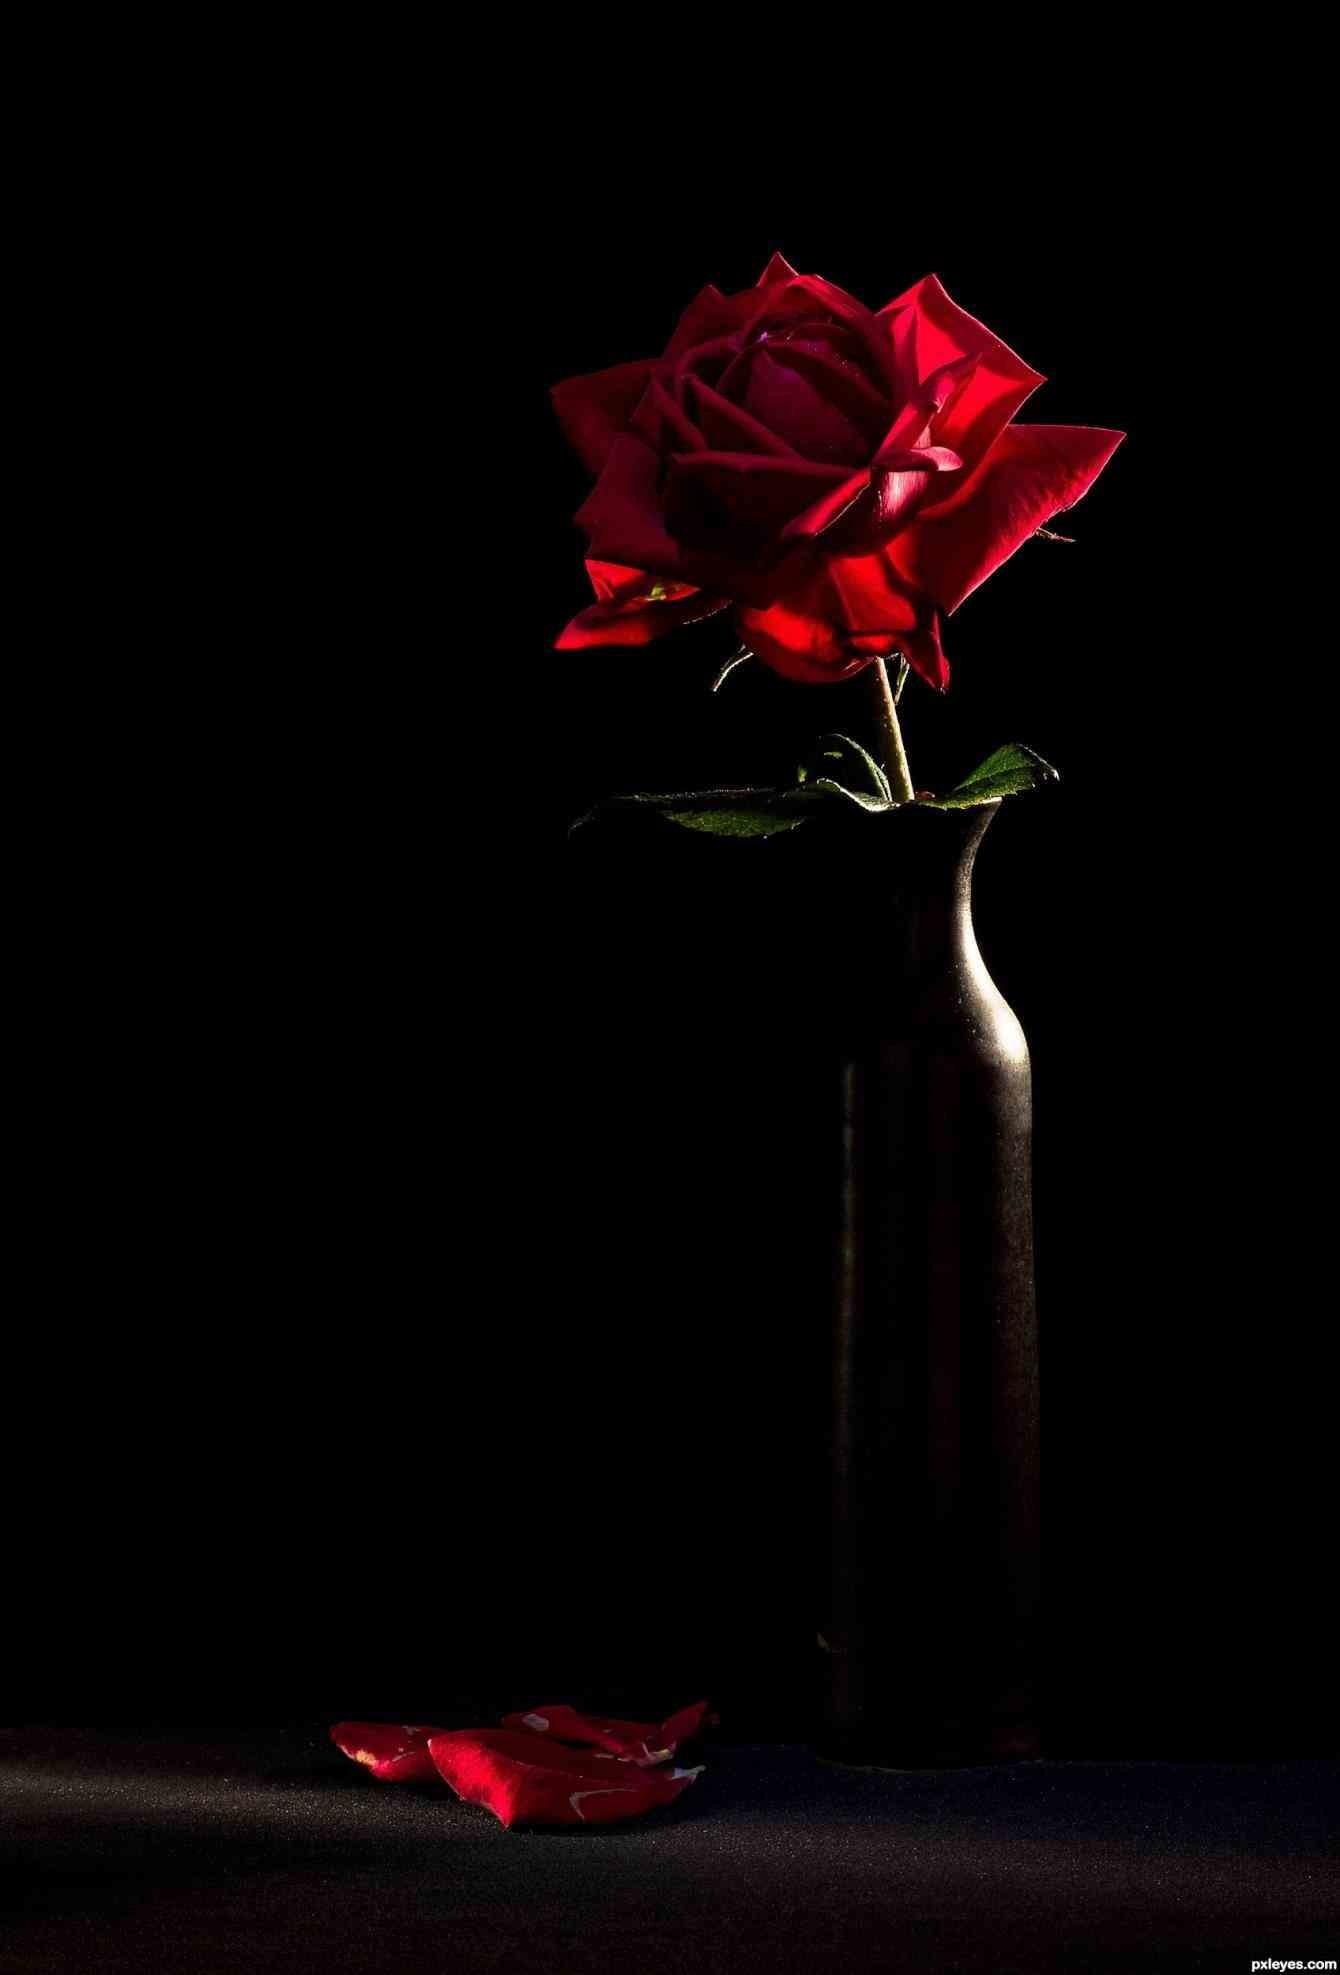 Red roses on black background wallpapertag - Black red rose wallpaper ...